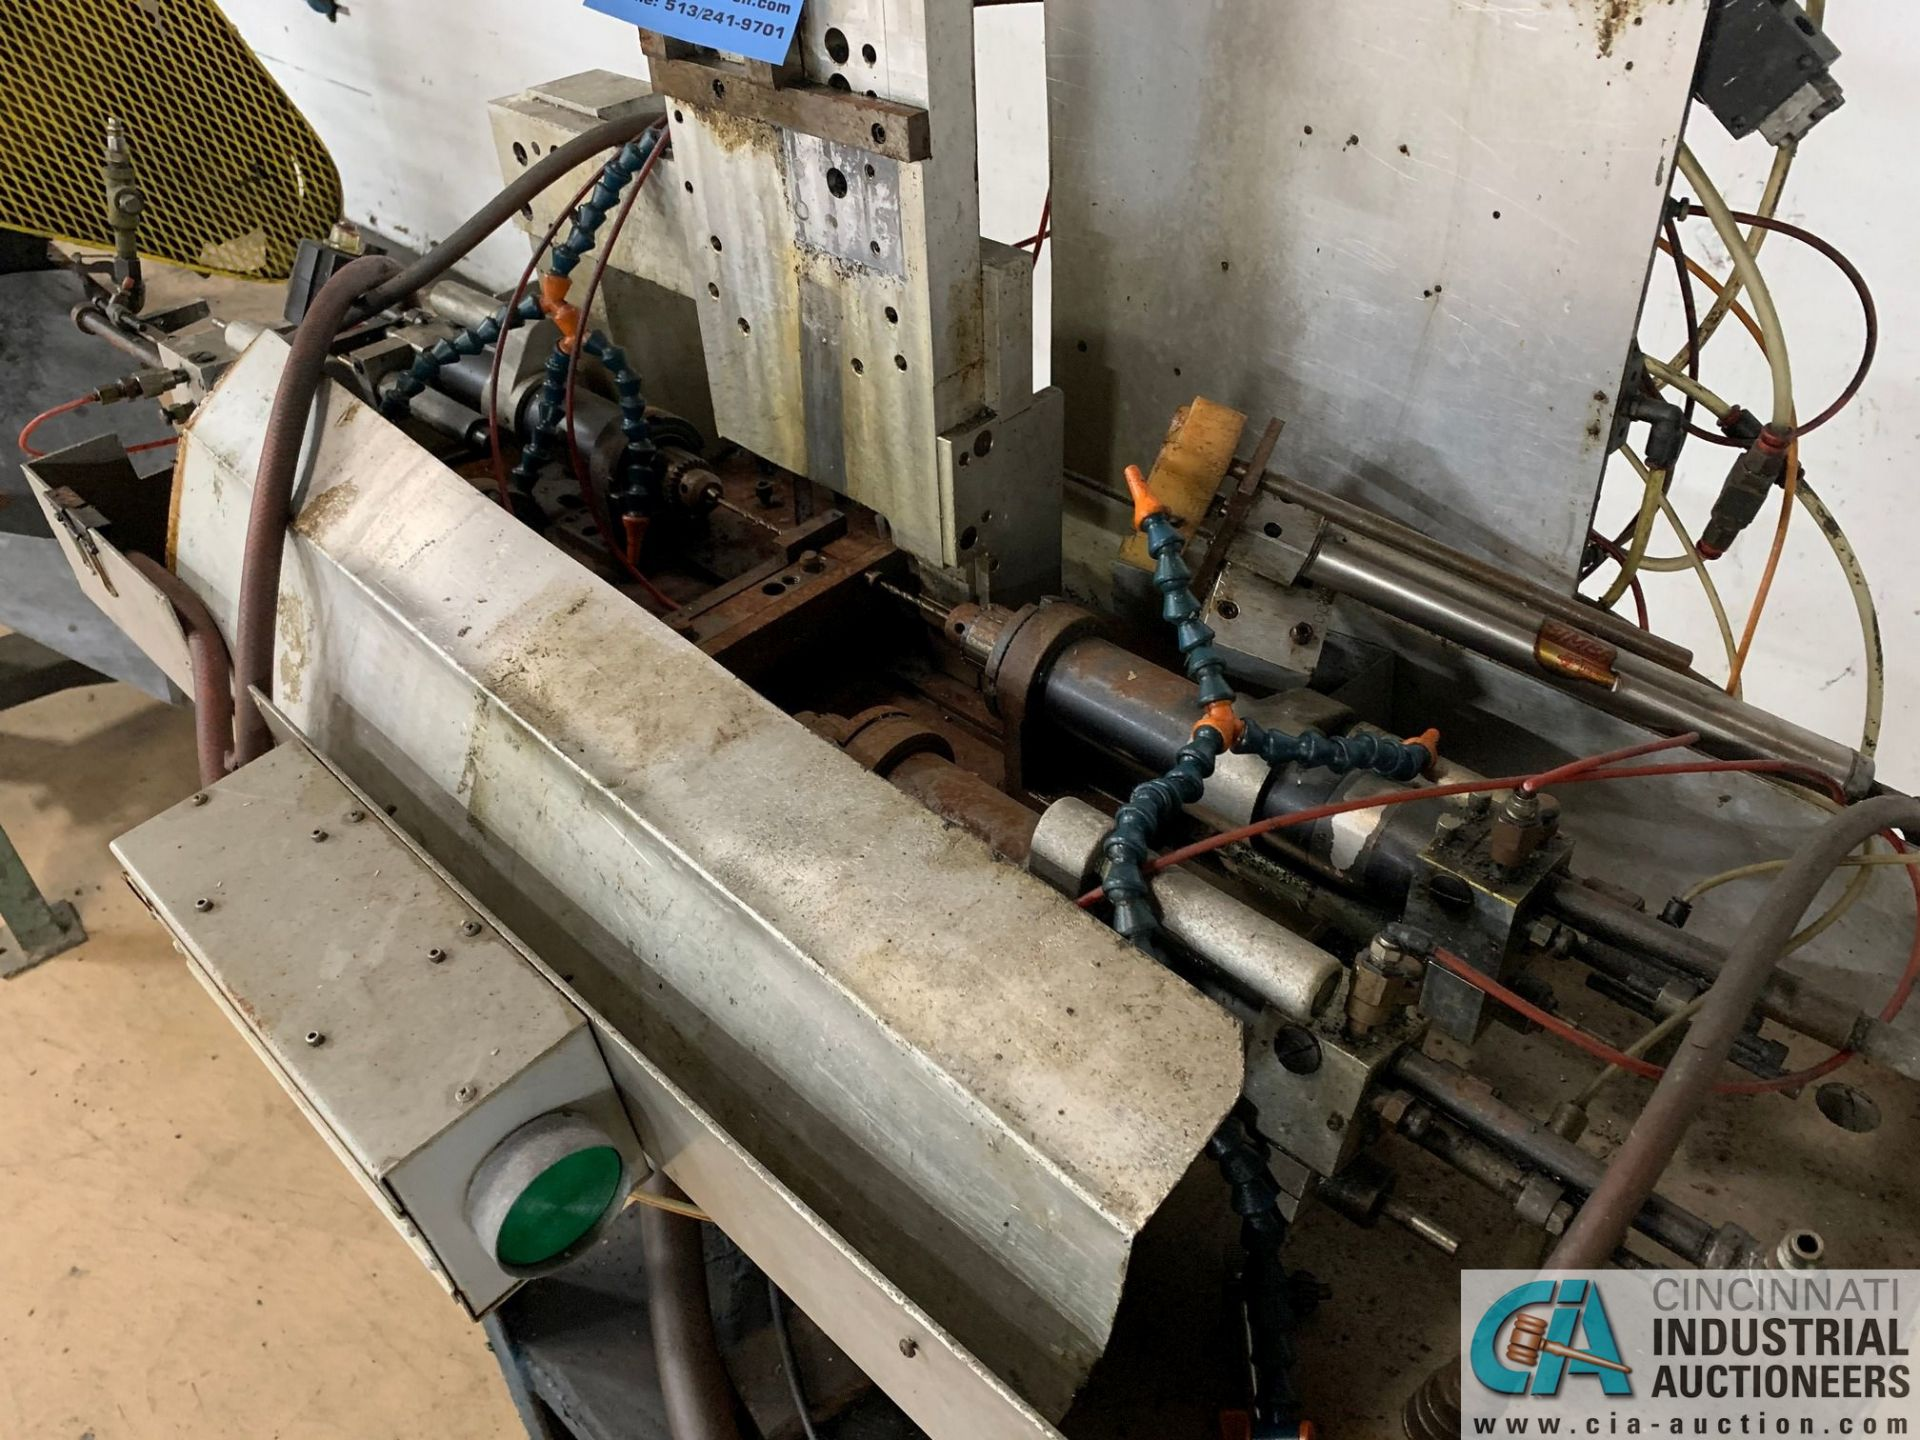 4-SPINDLE HORIZONTAL DRILLING MACHINE - Image 2 of 2